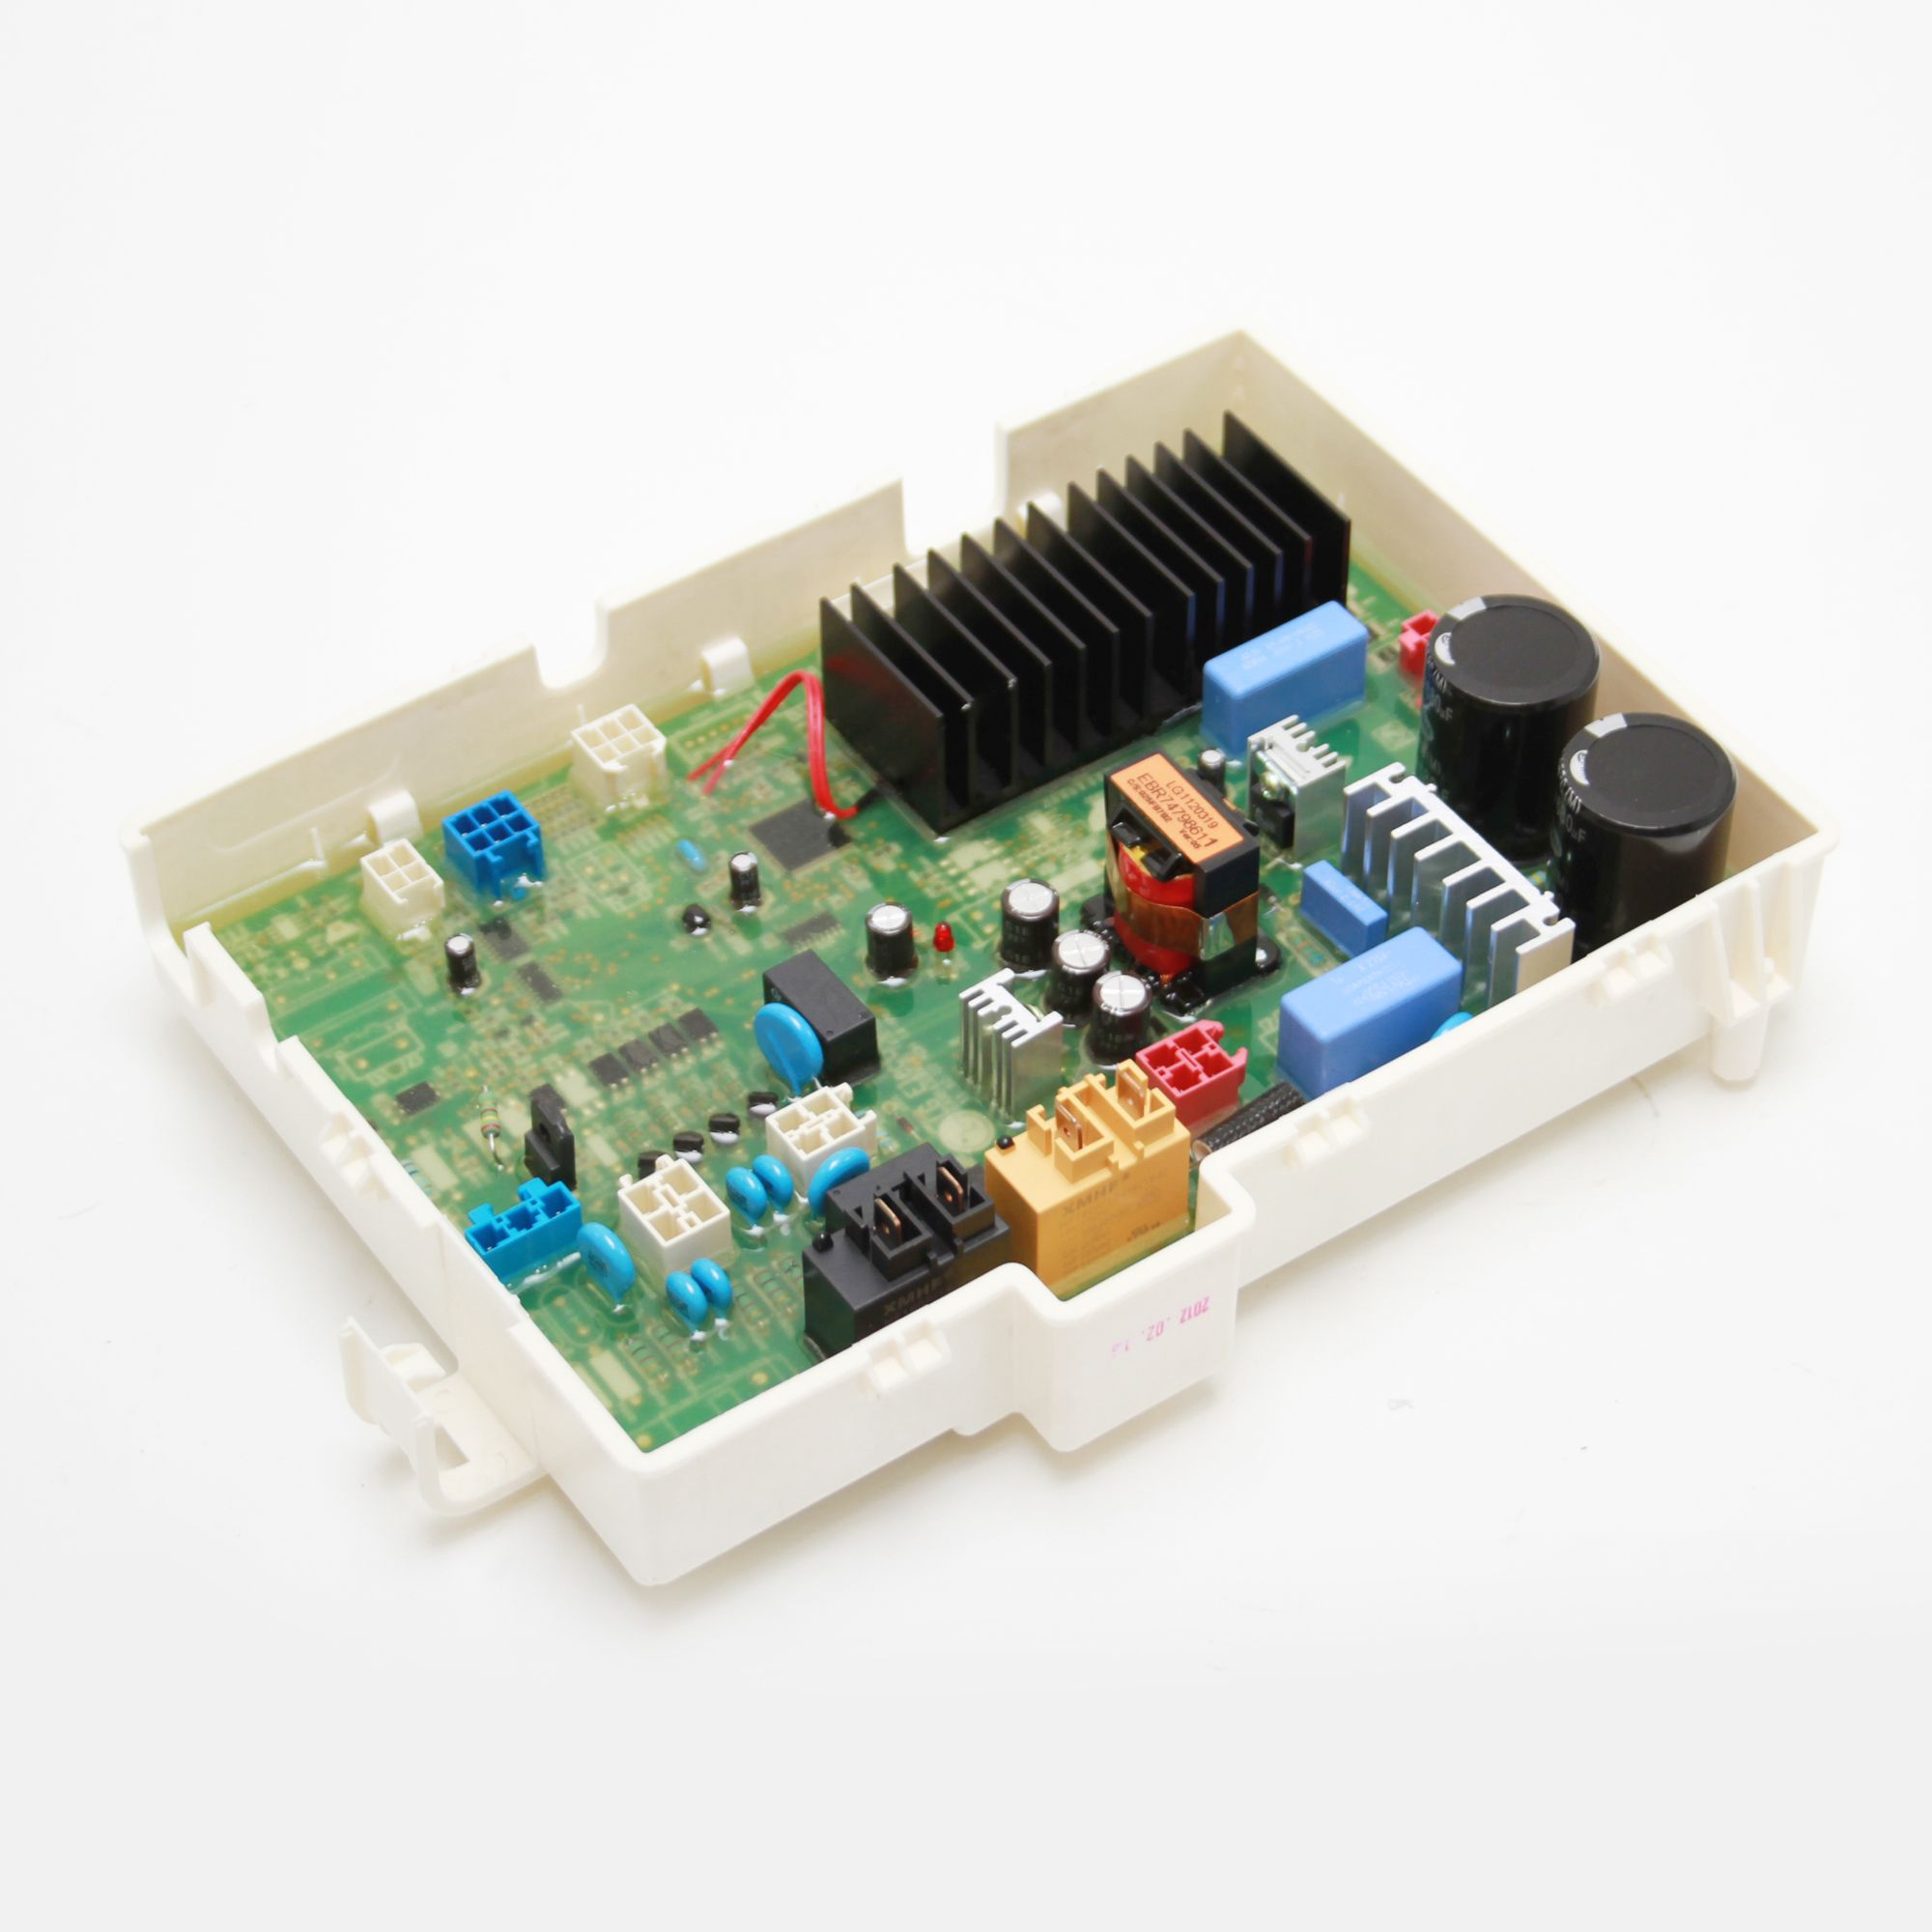 LG WASHING MACHINE CONTROL BOARD EBR39322401 WT-R107 WT-R854 WT-V1067TP ABWREAP